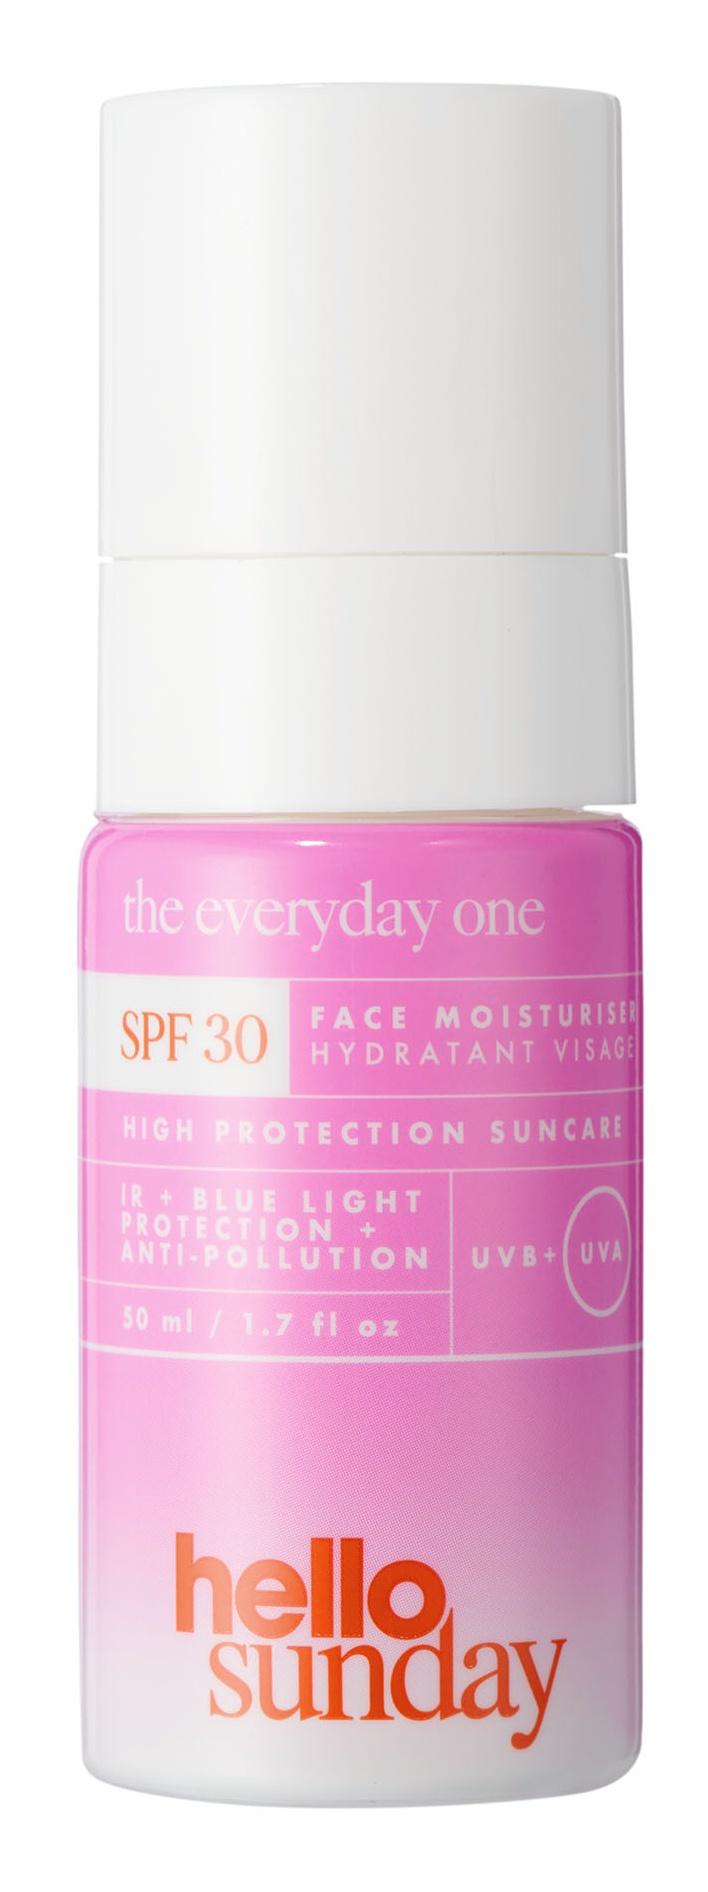 Hello Sunday The Everyday One Face Moisturiser SPF30